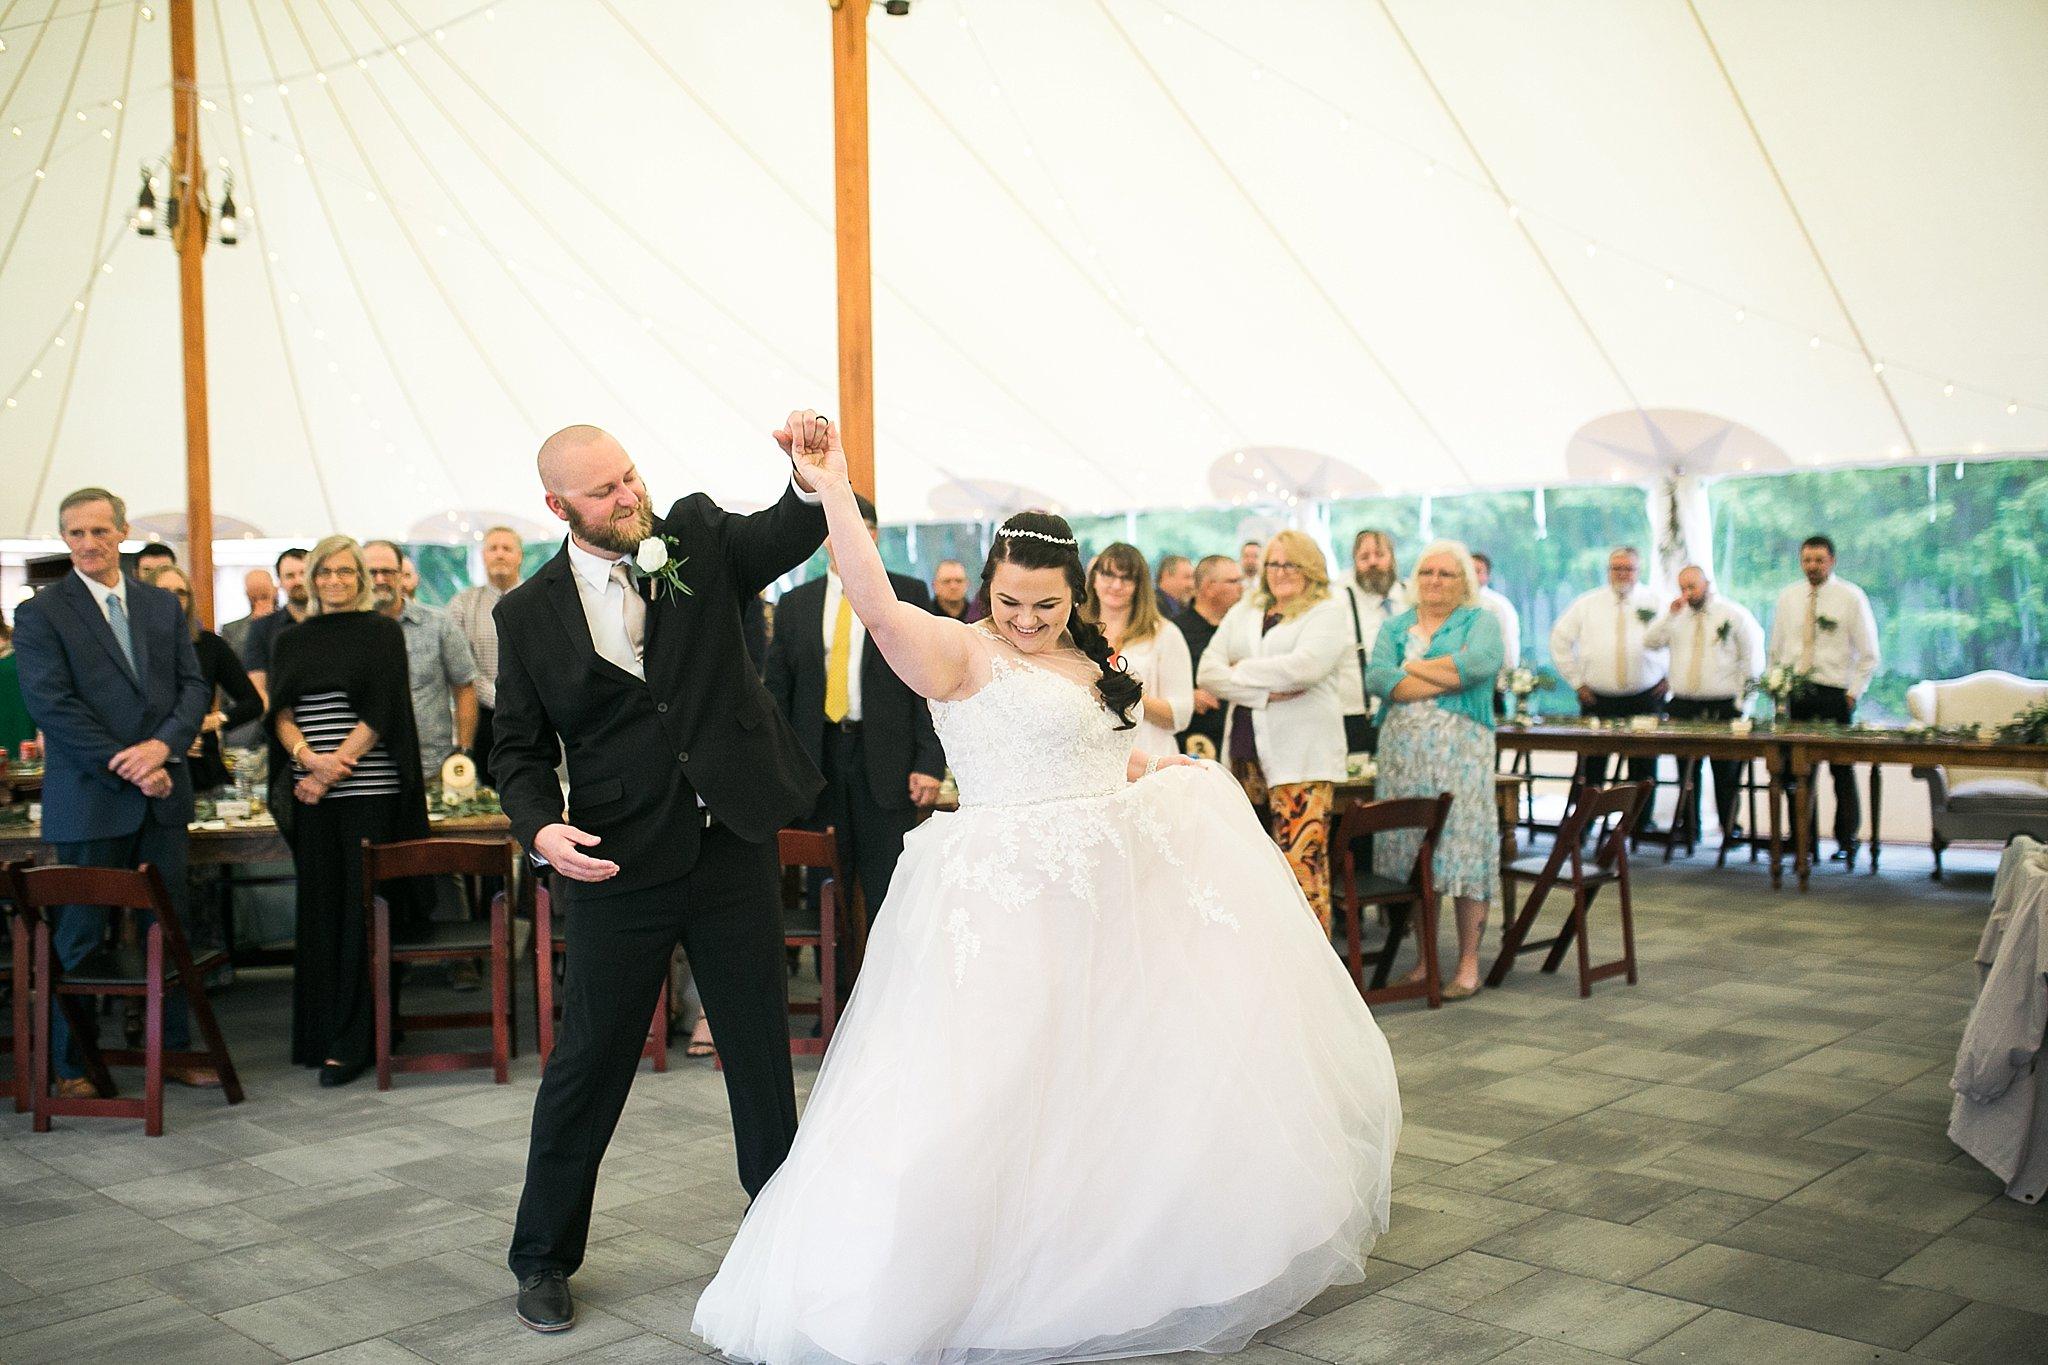 Preserve at Chocorua Tamworth NH Wedding May Wedding New Hampshire Wedding 128.jpg